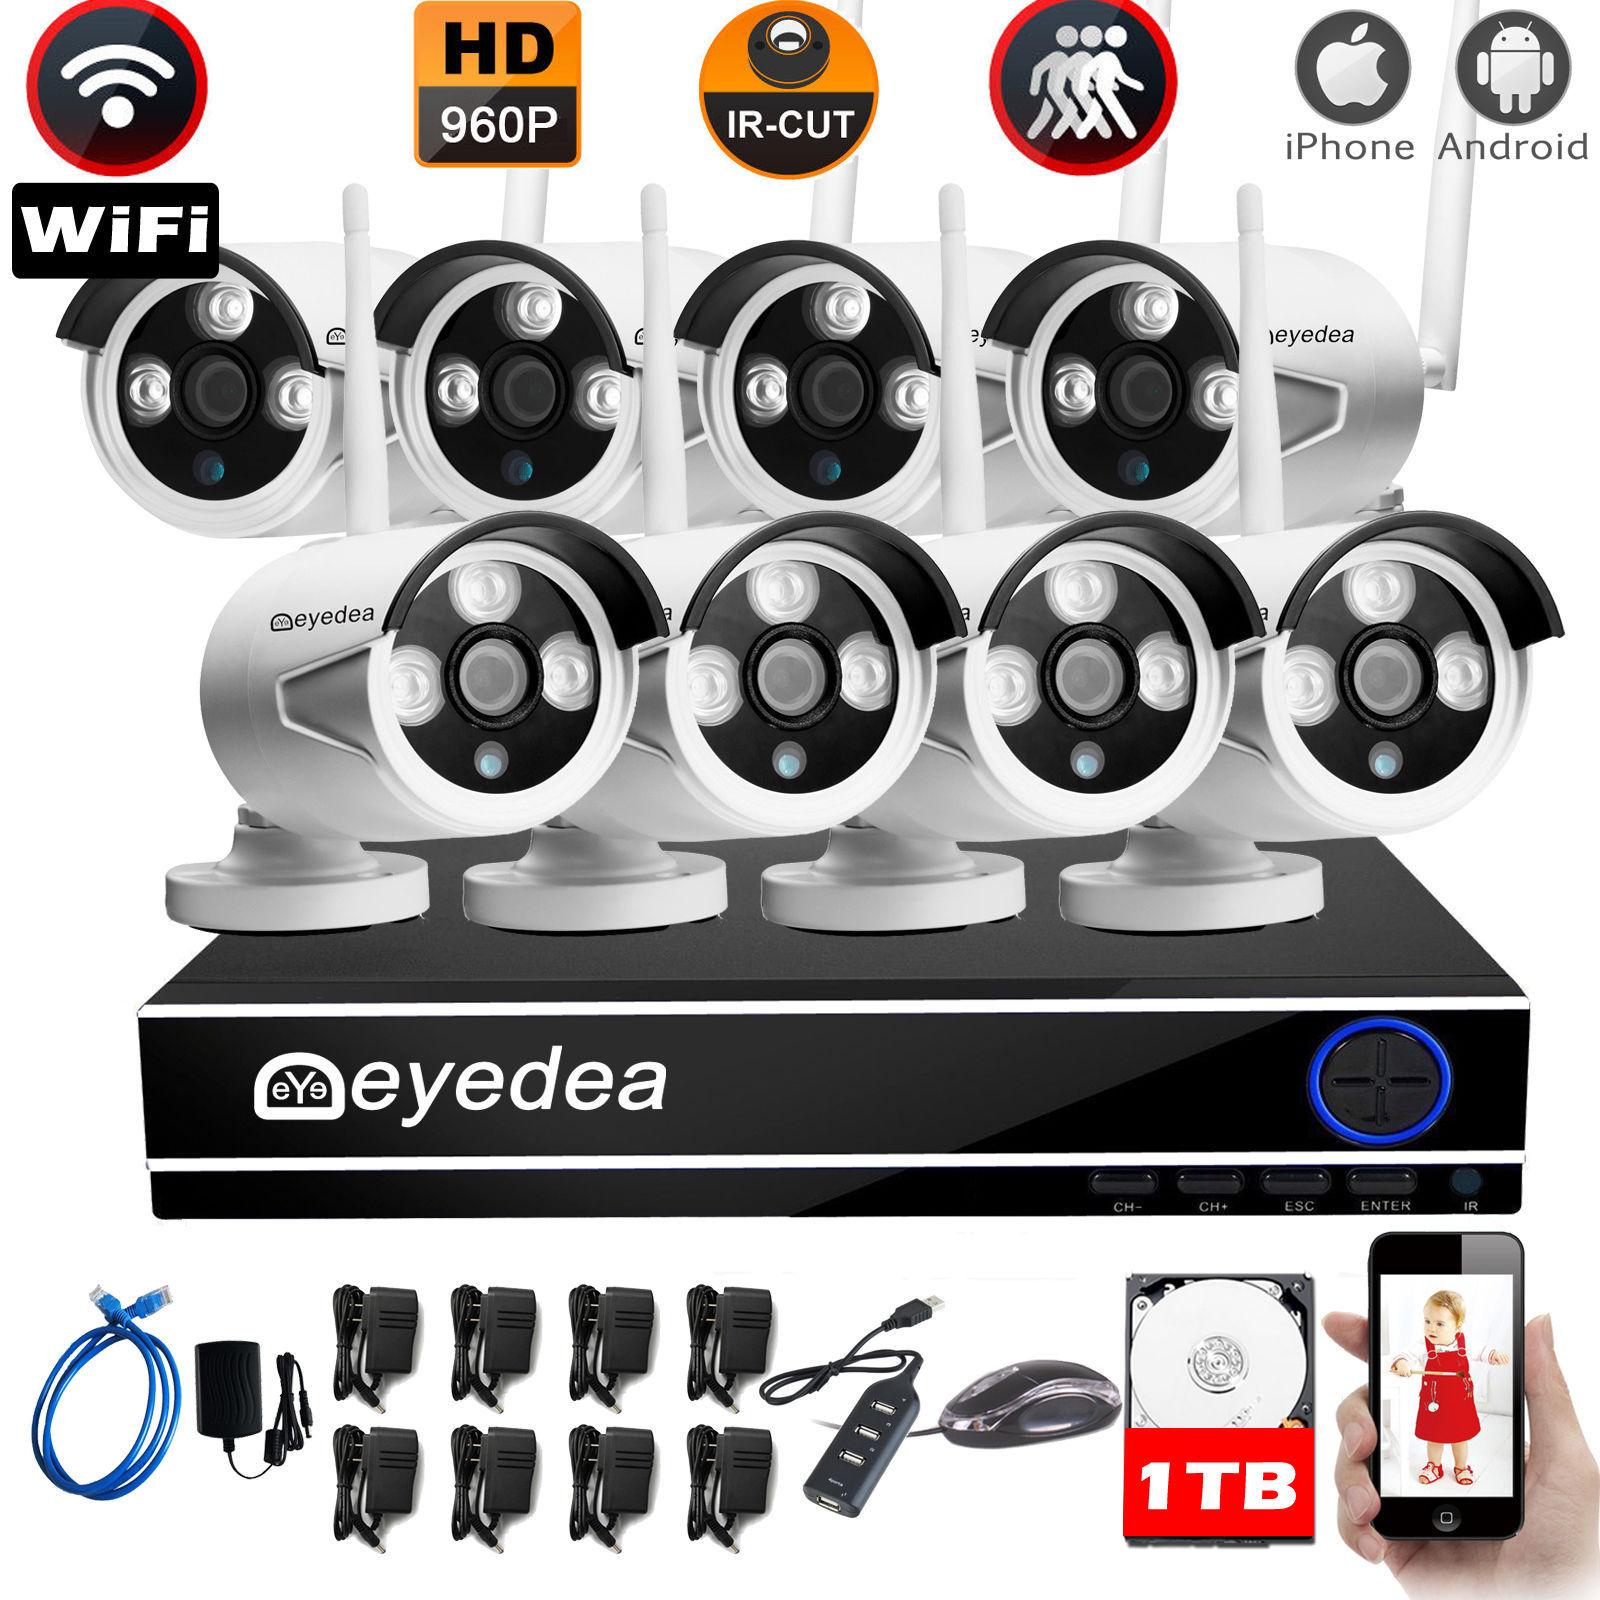 8CH 960P WiFi 5500TVL DVR NVR Cafe Burglar Alarm CCTV Security Camera System 1TB